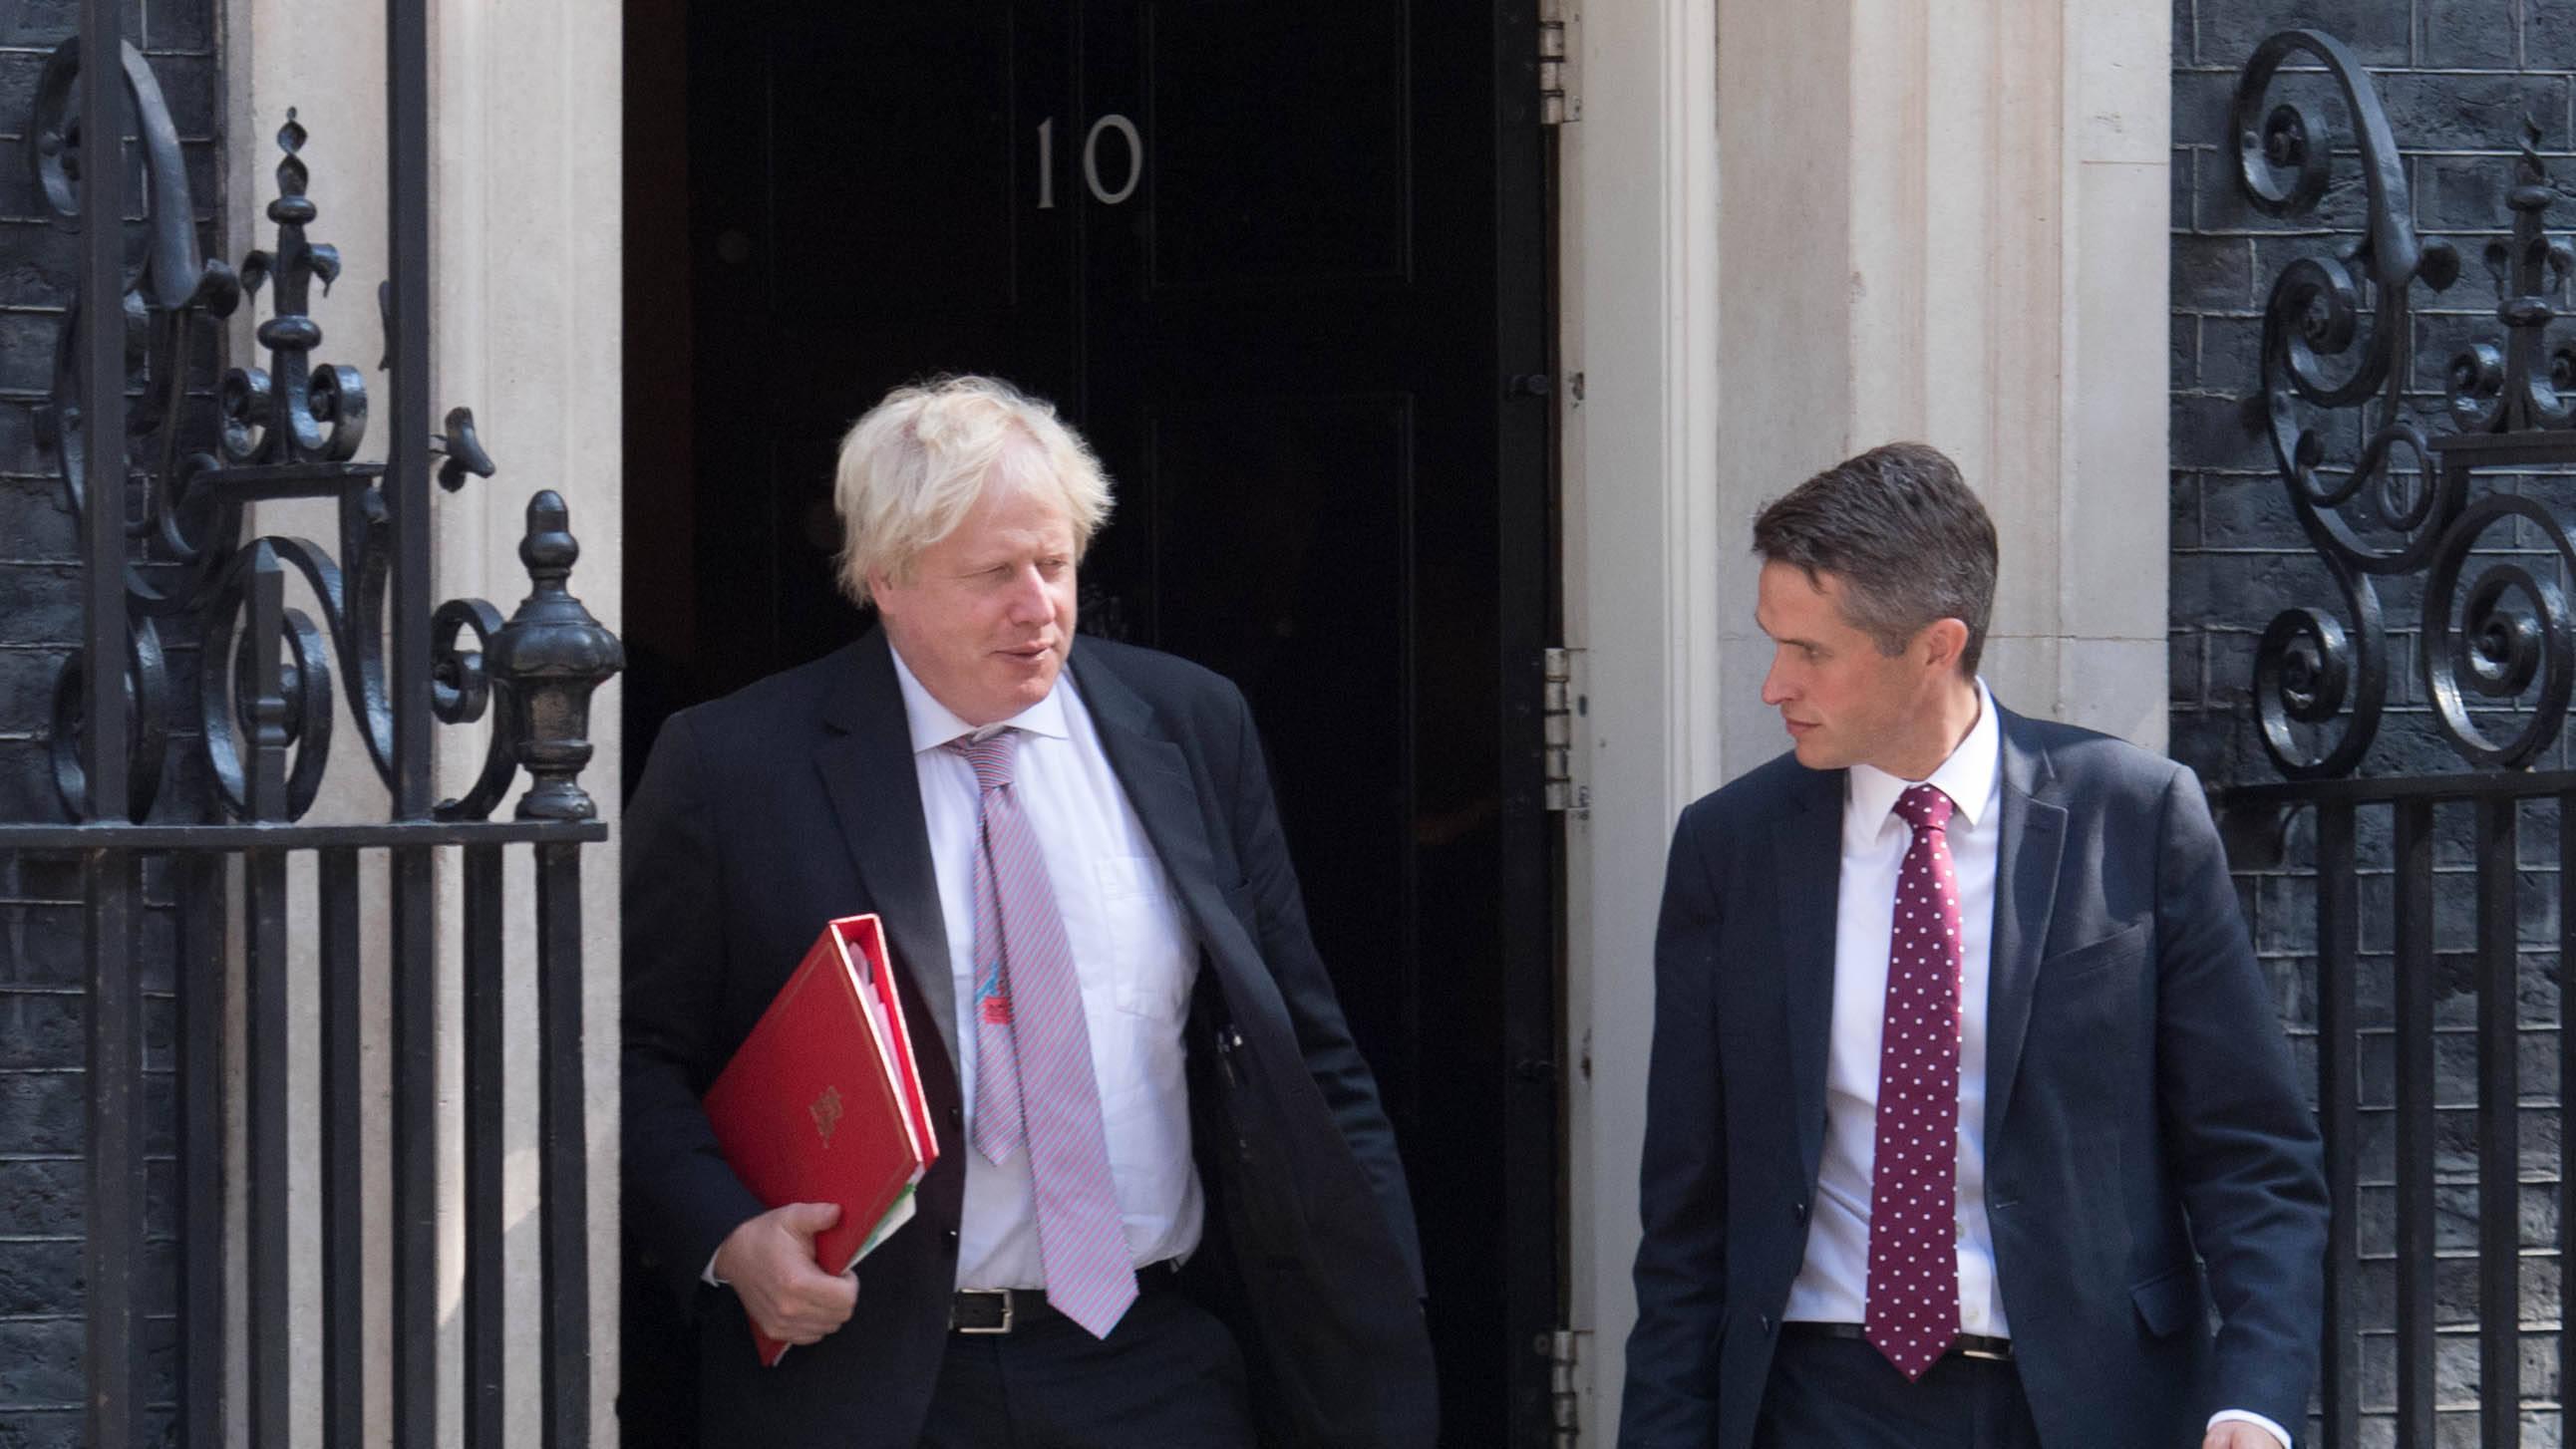 Boris Johnson's Inbox: The Five Key Things The New PM Will Need To Do